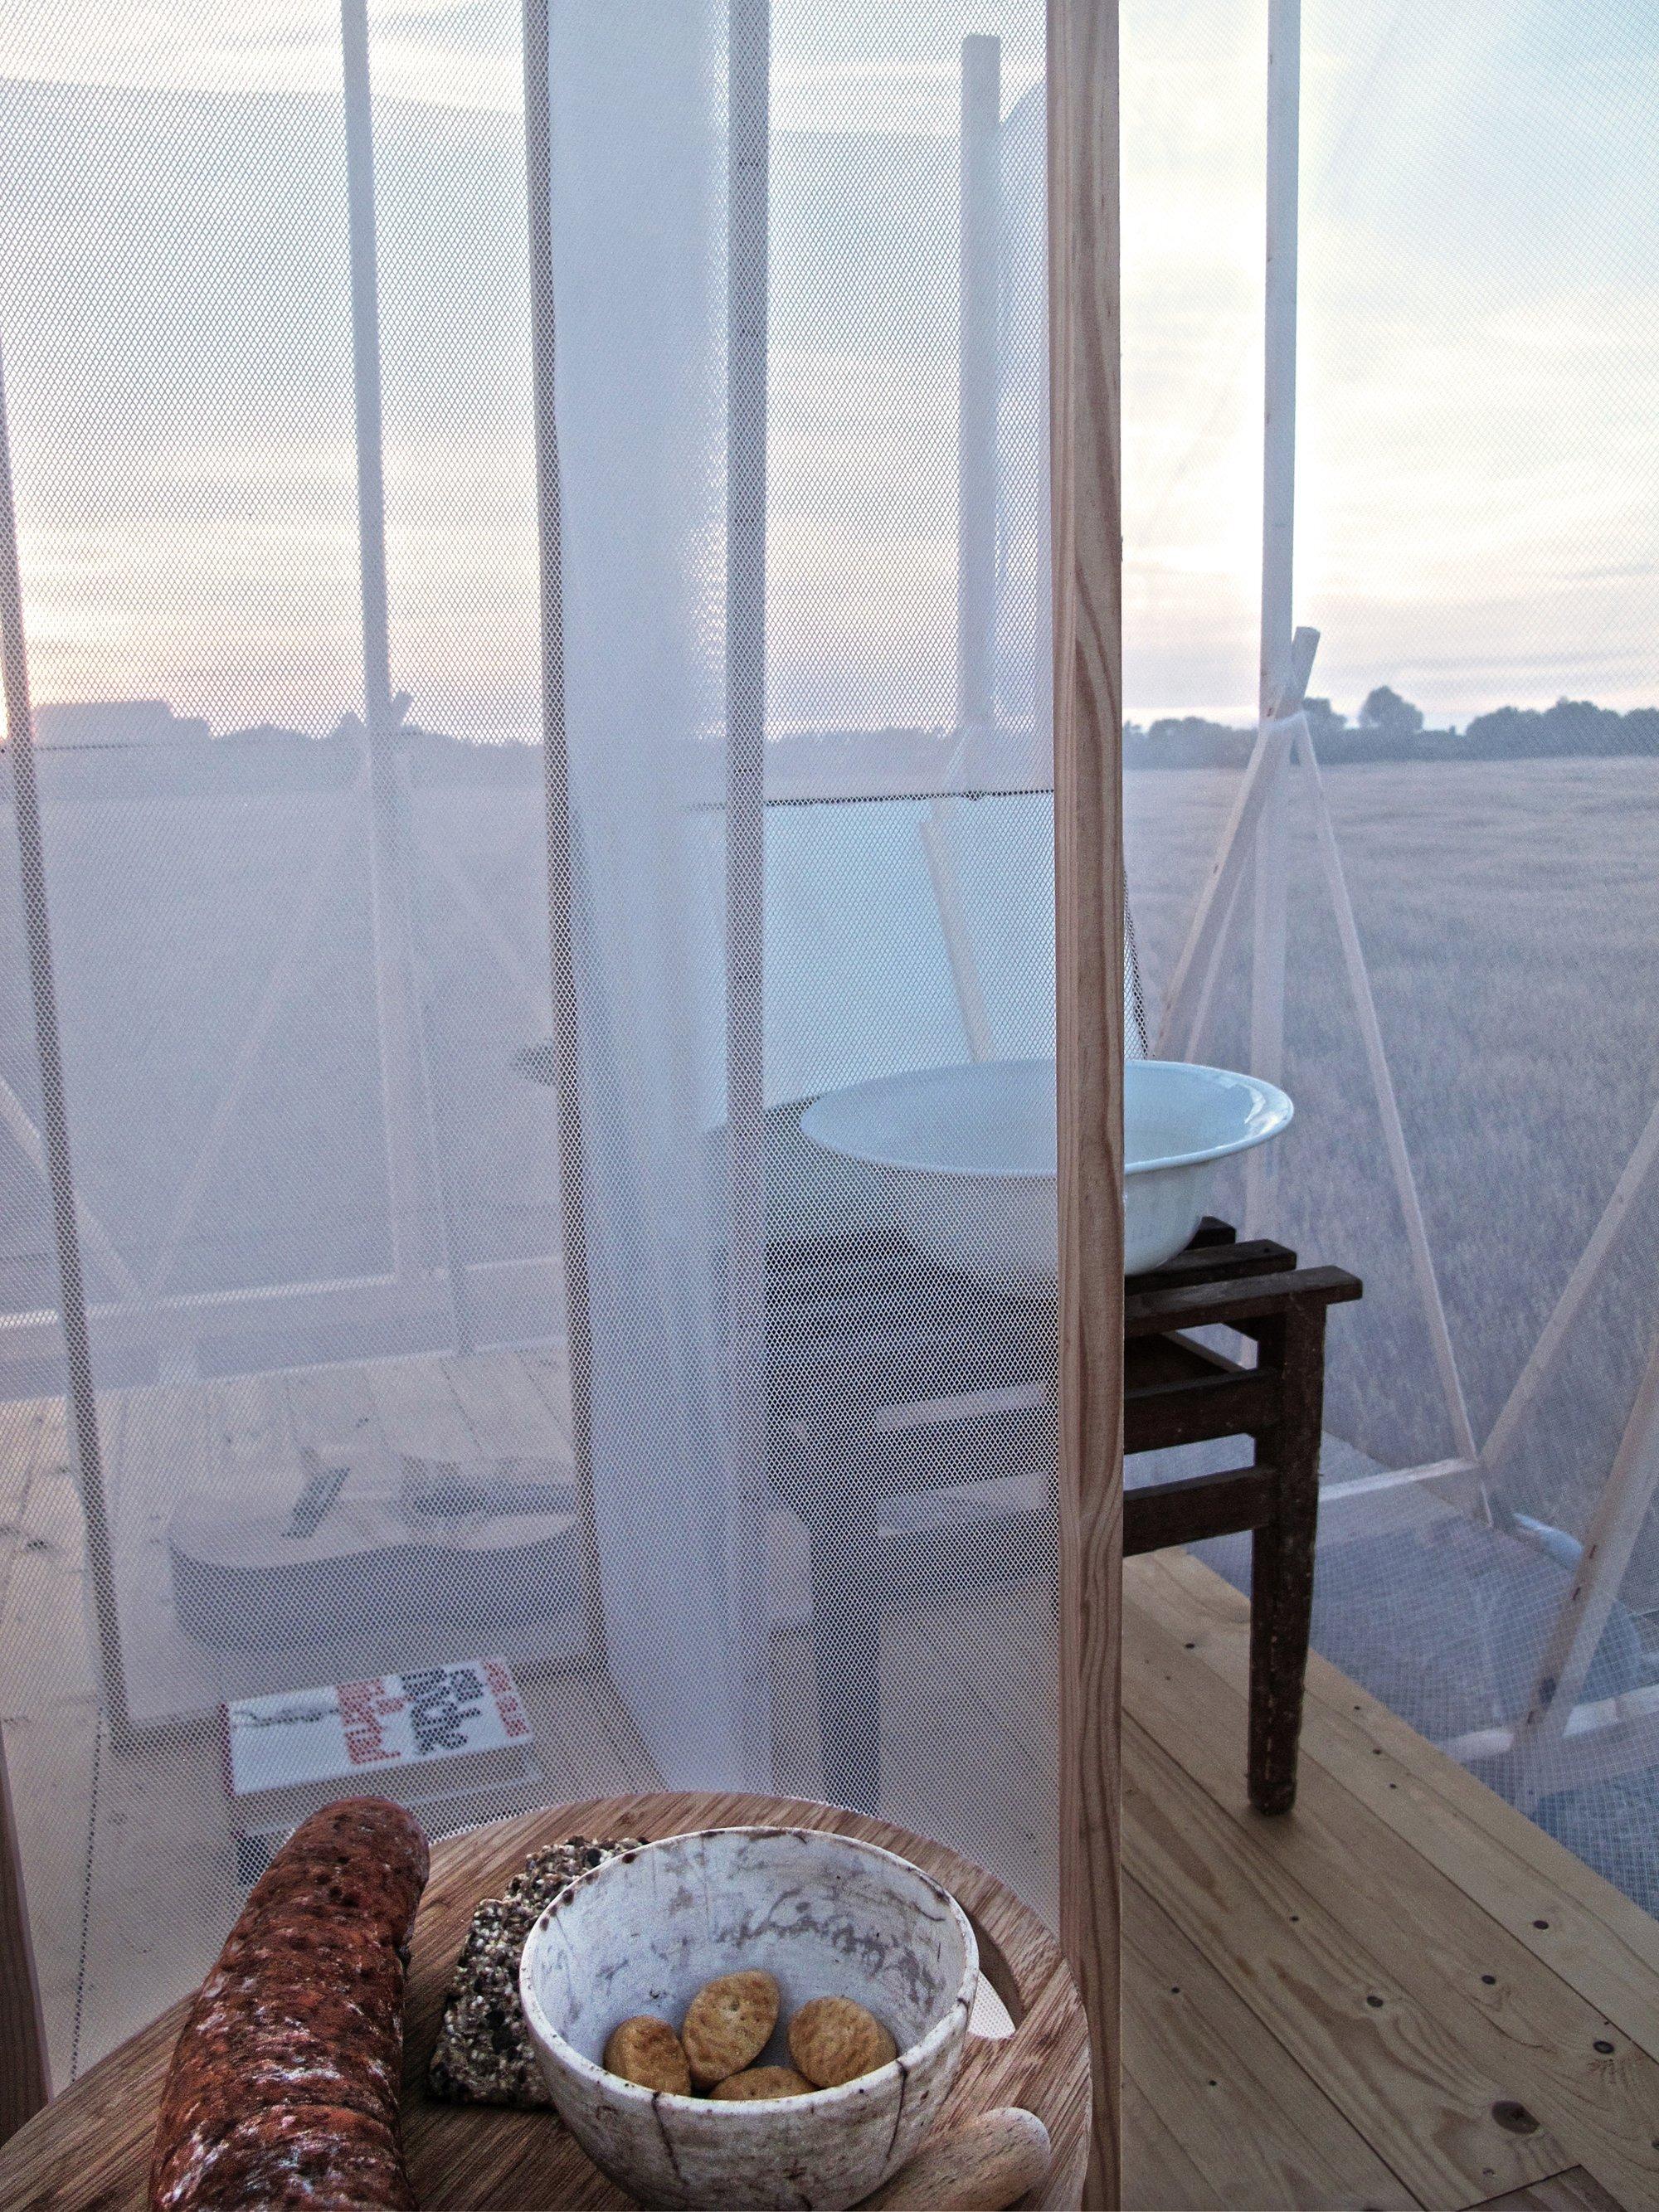 Grooming Retreat - Tiny Retreat - Gartnerfuglen - Spain - Wash Basin - Humble Homes